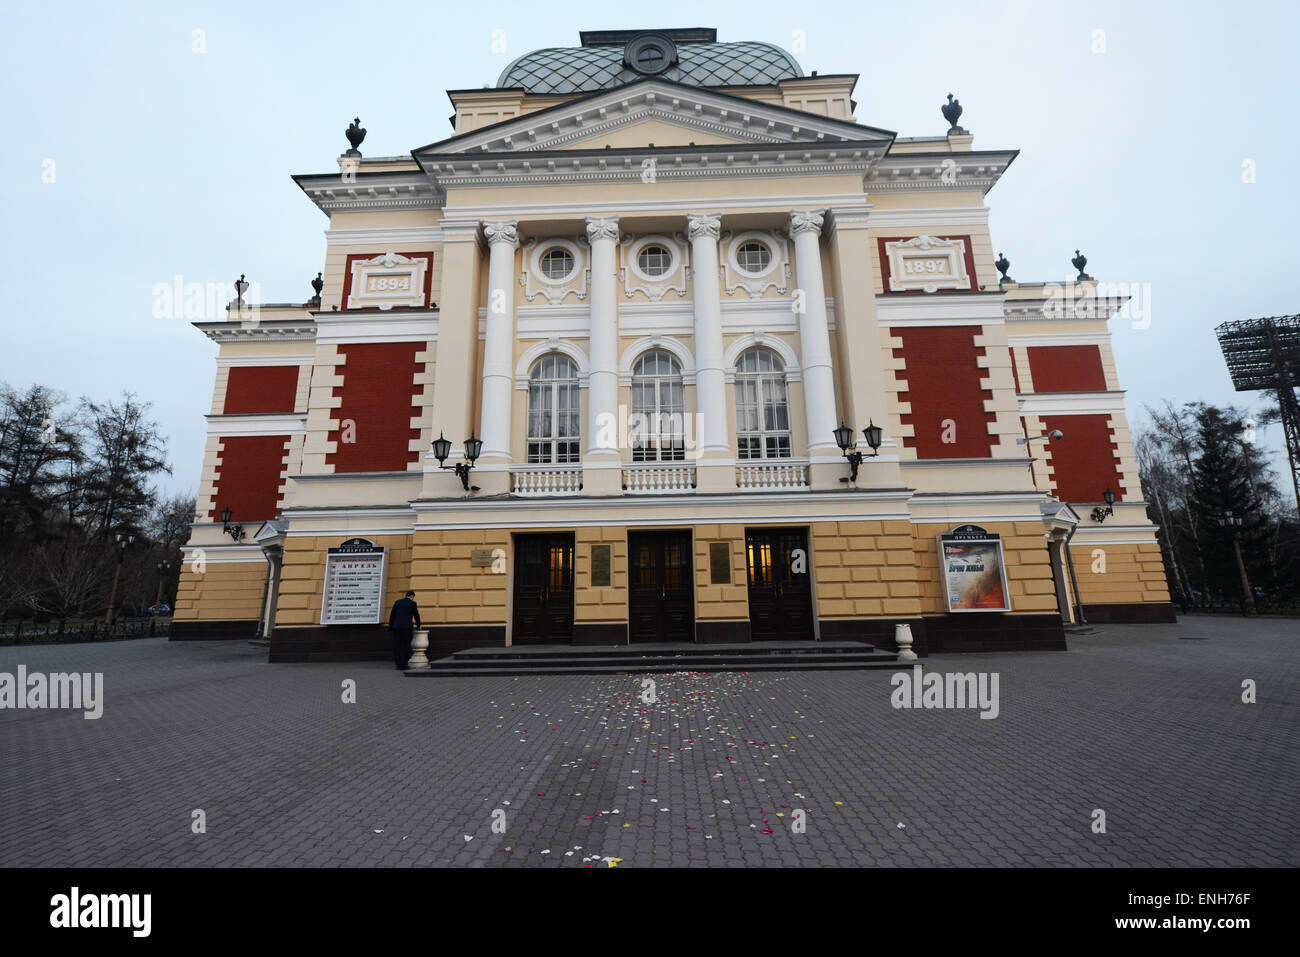 The Okhlopkov Academic Theater in Irkutsk. - Stock Image